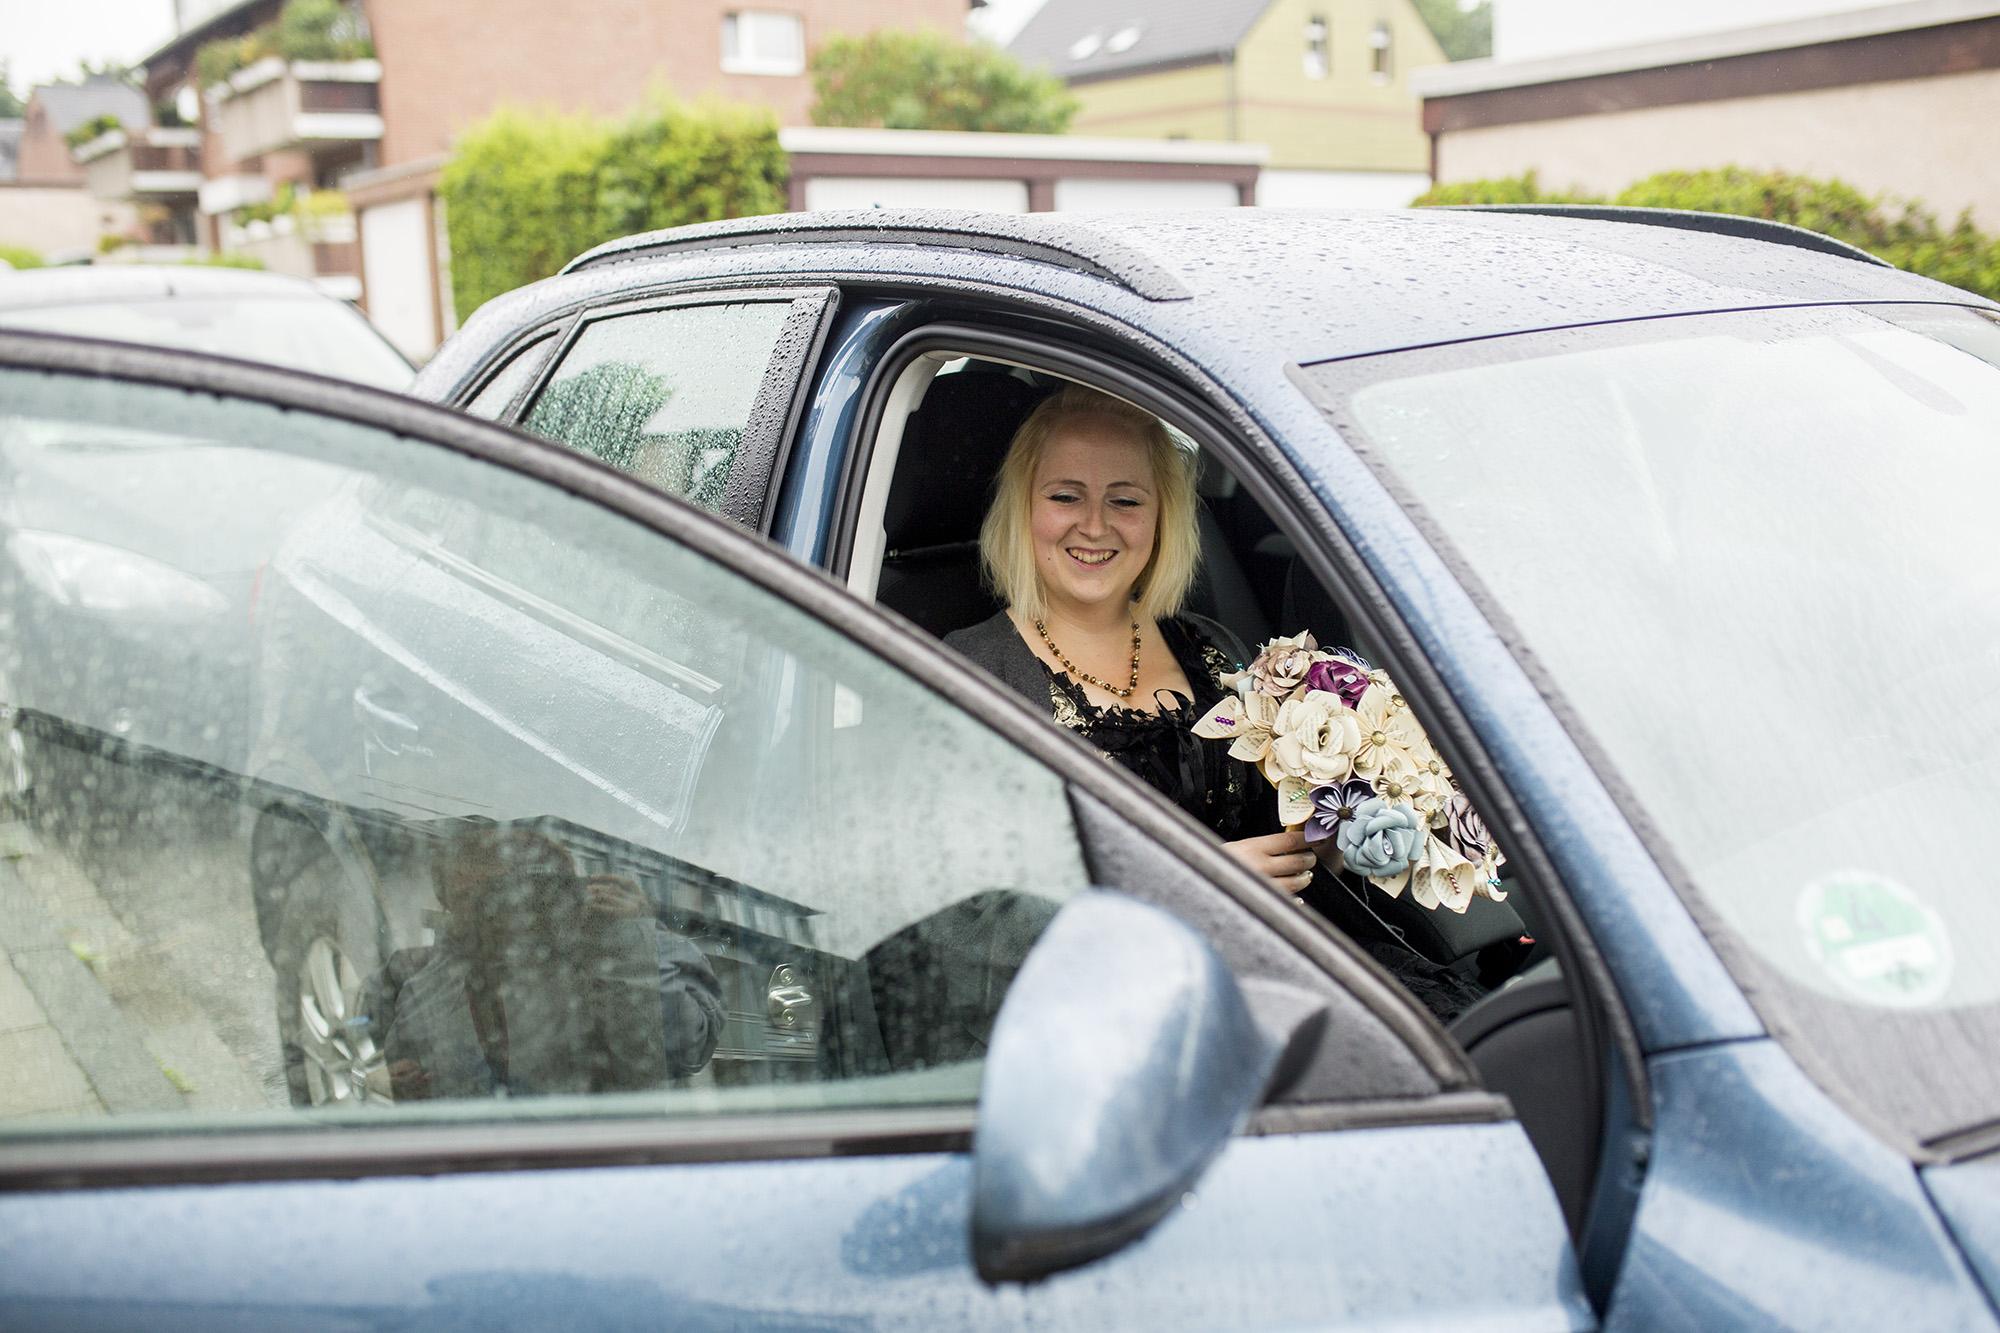 Seriously_Sabrina_Photography_Essen_Germany_RocknRoll_Hochzeit_Wedding_PatrickJenny19.jpg